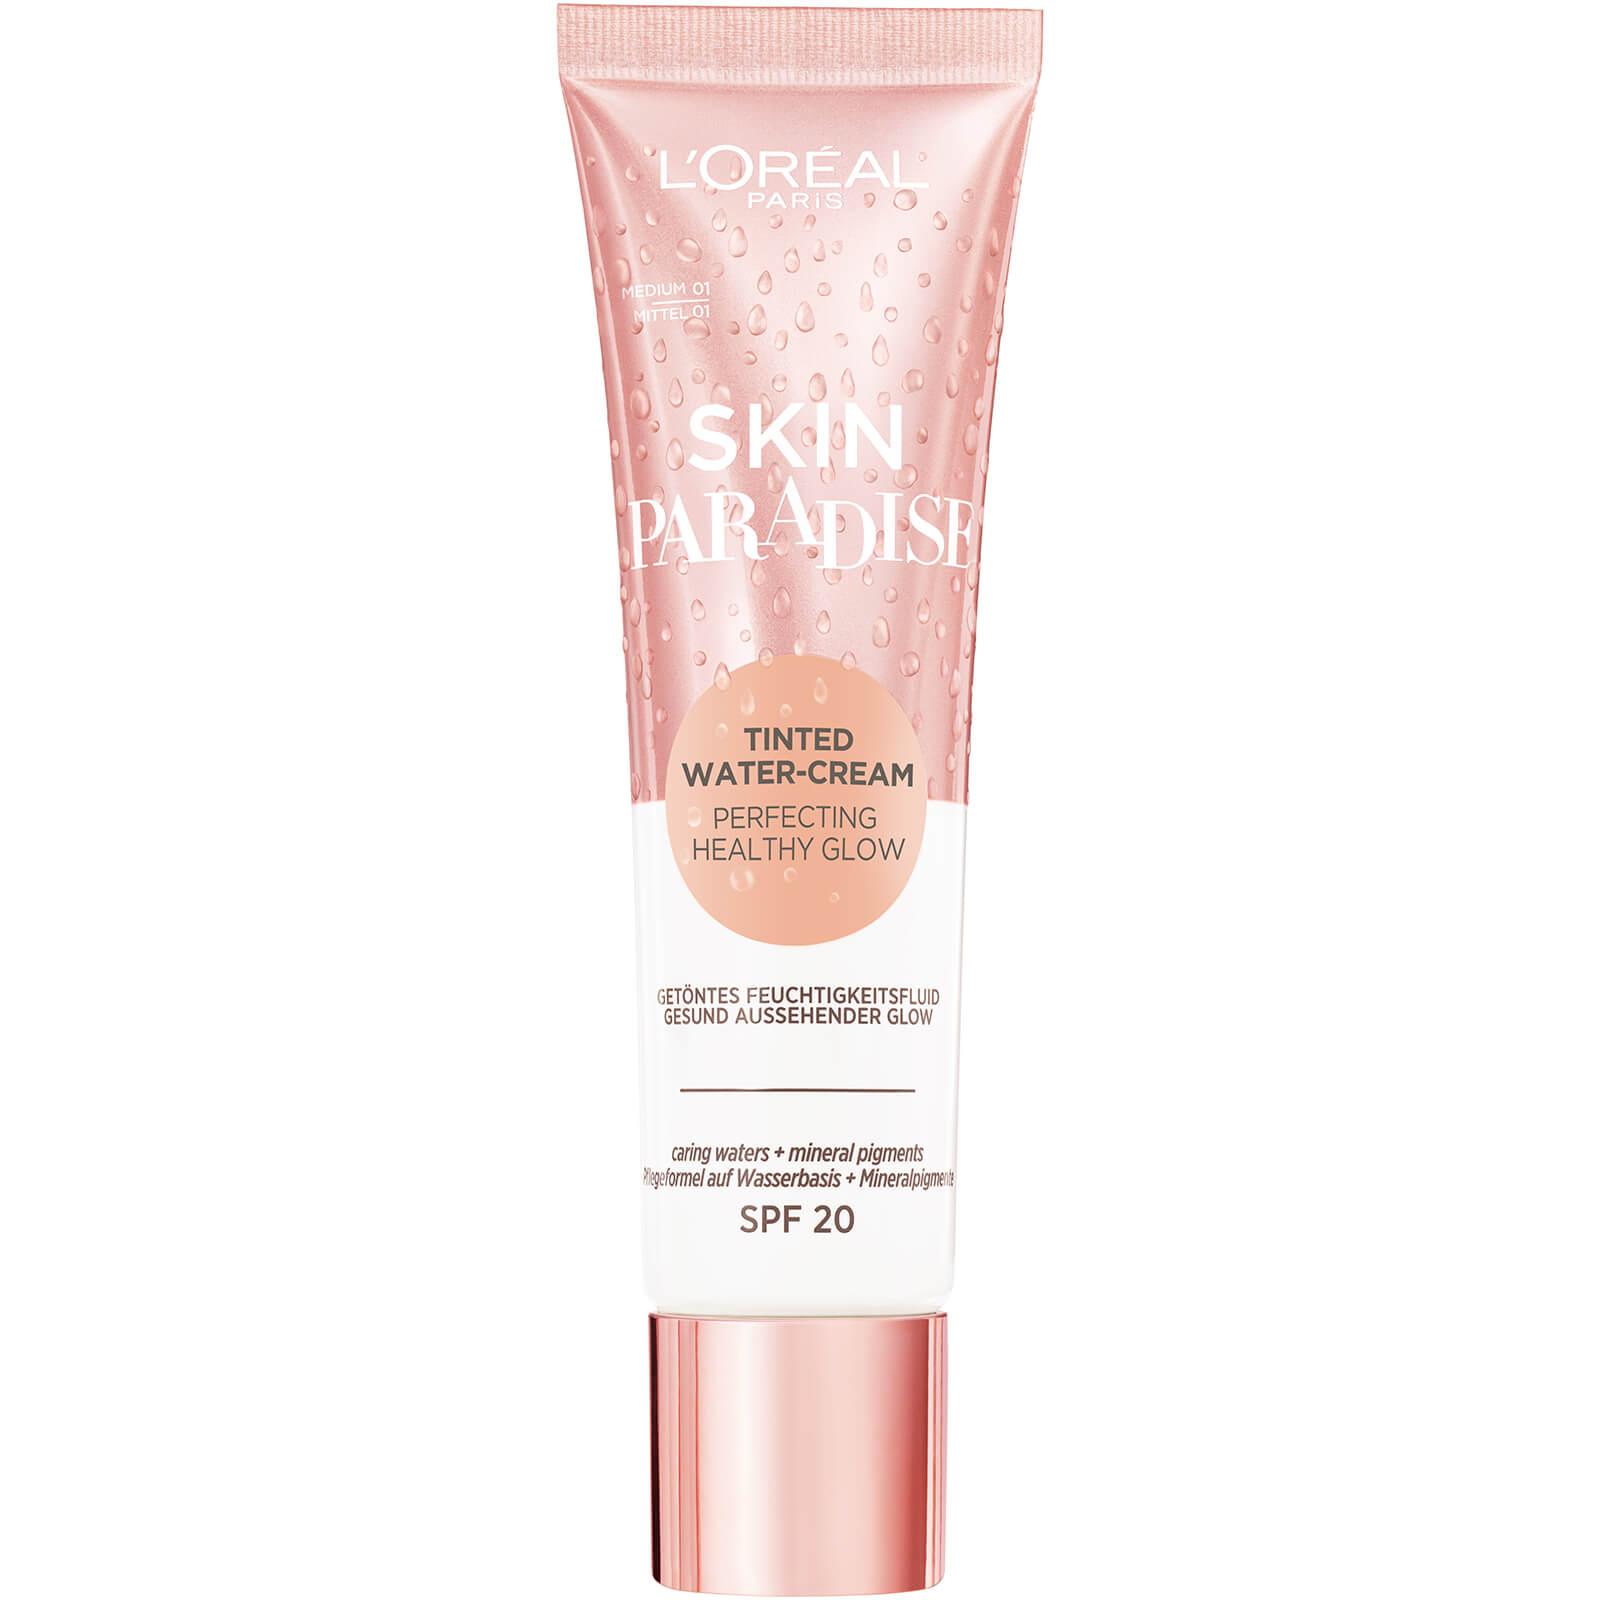 Купить L'Oréal Paris Skin Paradise Tinted Moisturiser SPF20 30ml (Various Shades) - Medium 01